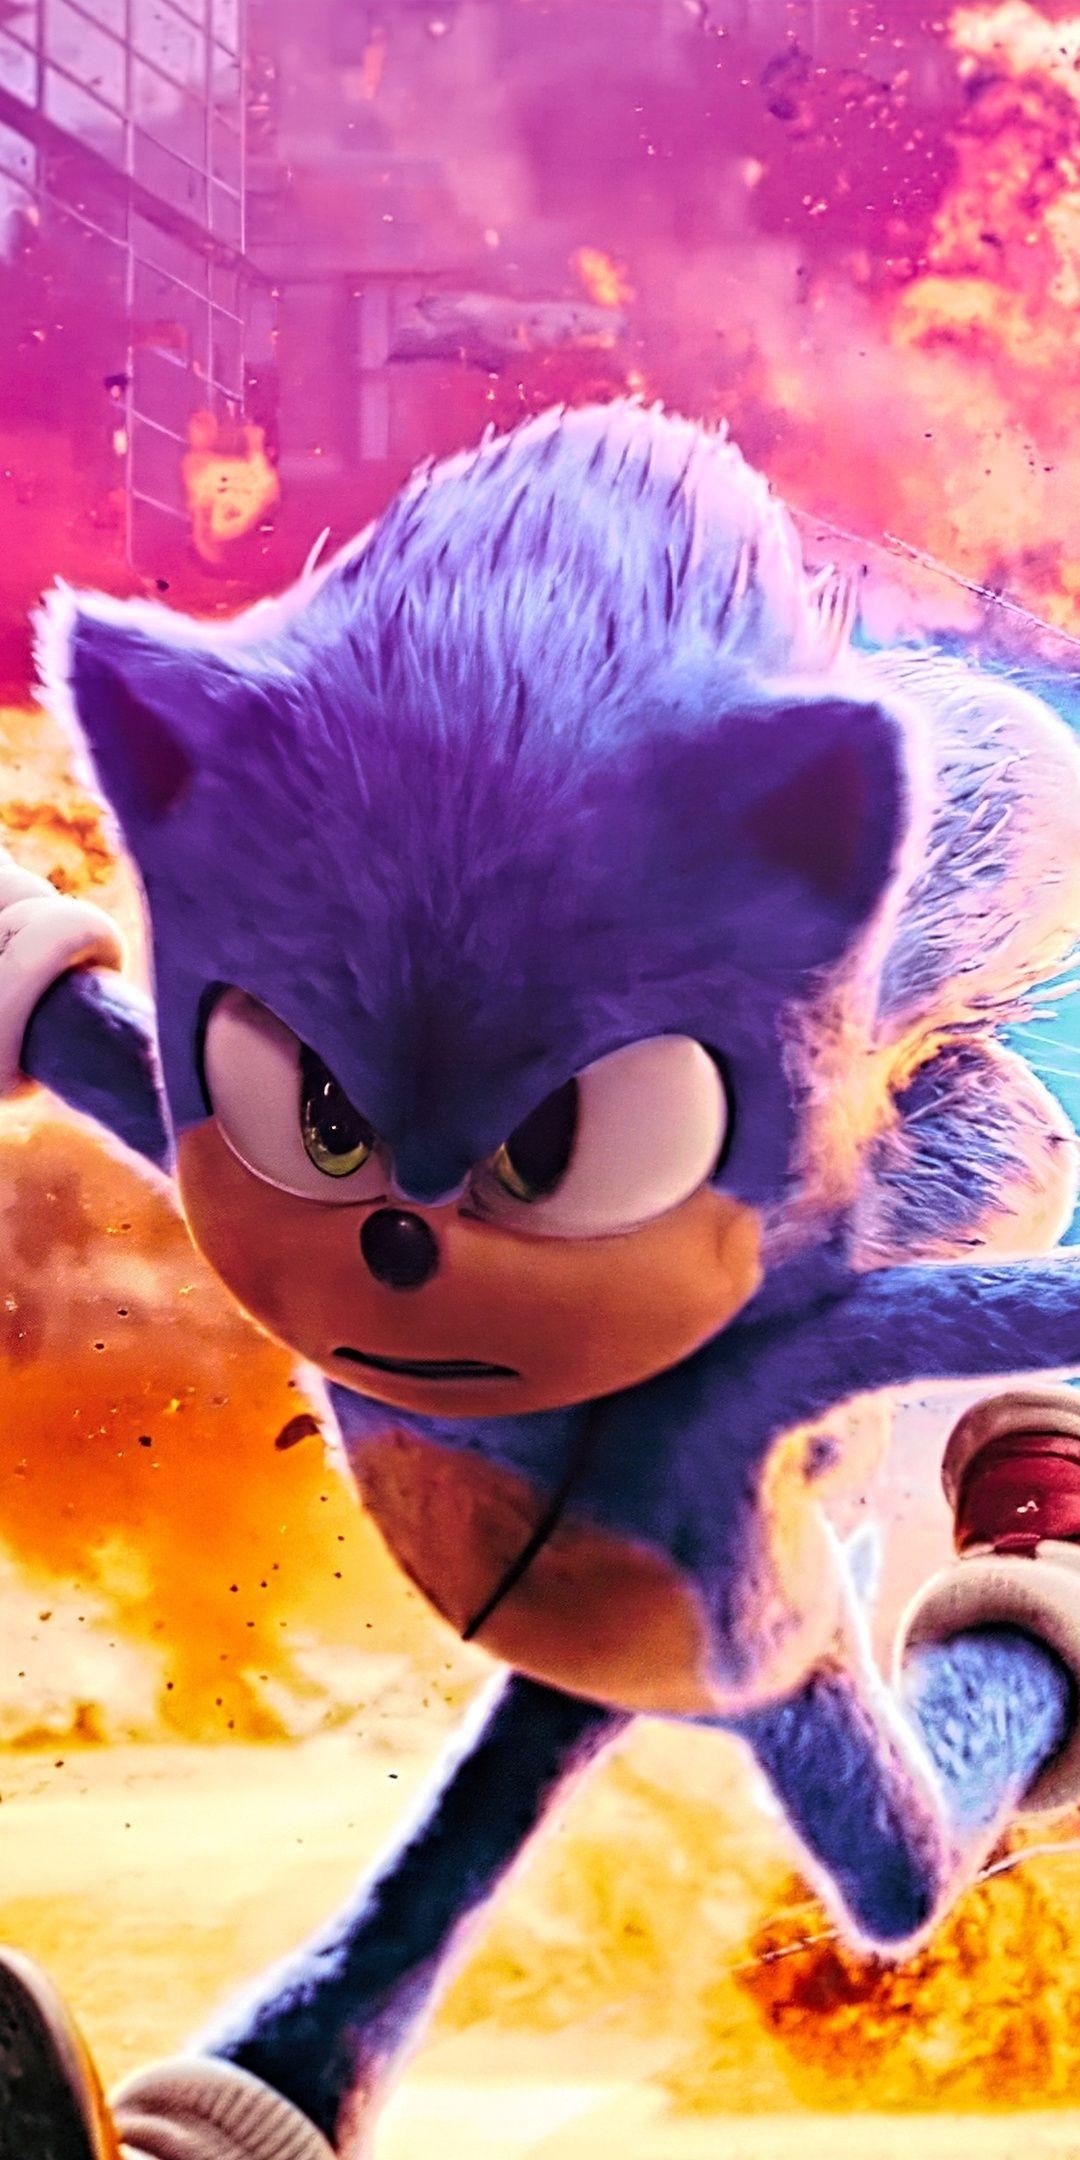 1080x2160 Movie Run Sonic The Hedgehog 2020 Wallpaper Hedgehog Movie Sonic The Hedgehog Movie Wallpapers